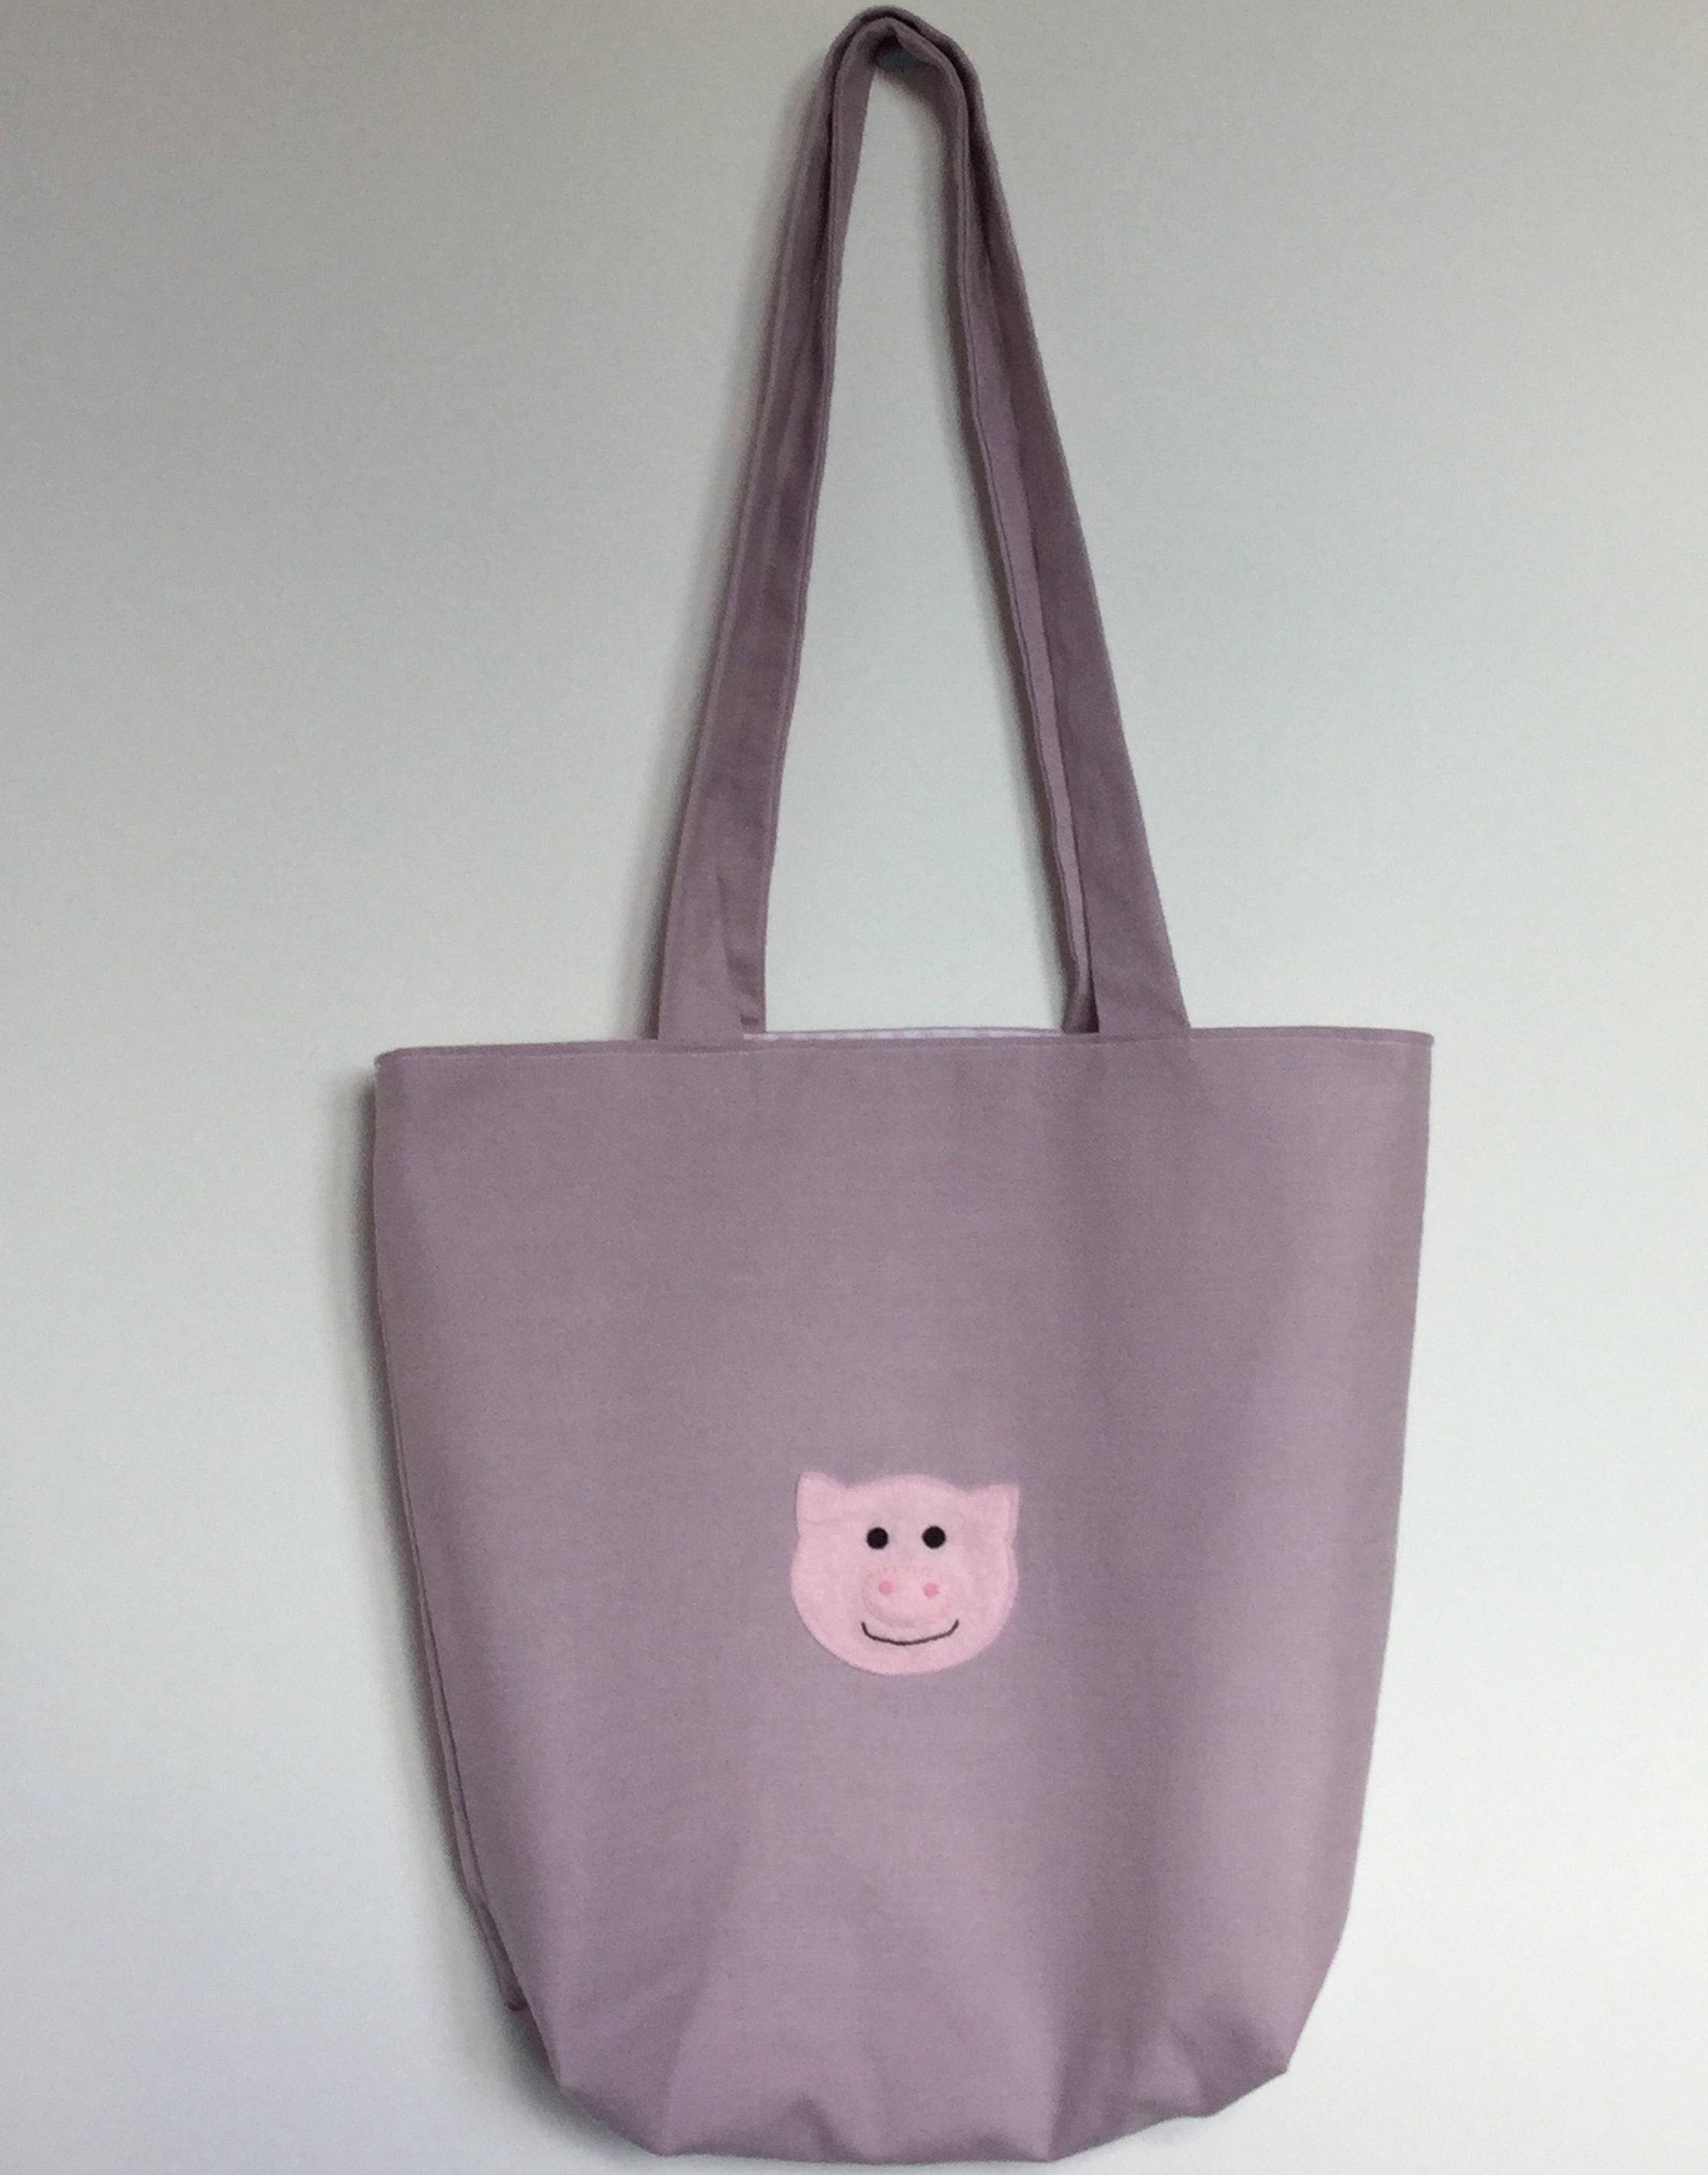 Pig Tote Bag  Childs bag  handmade  Cute Piggy Bag  pink  dusky pink